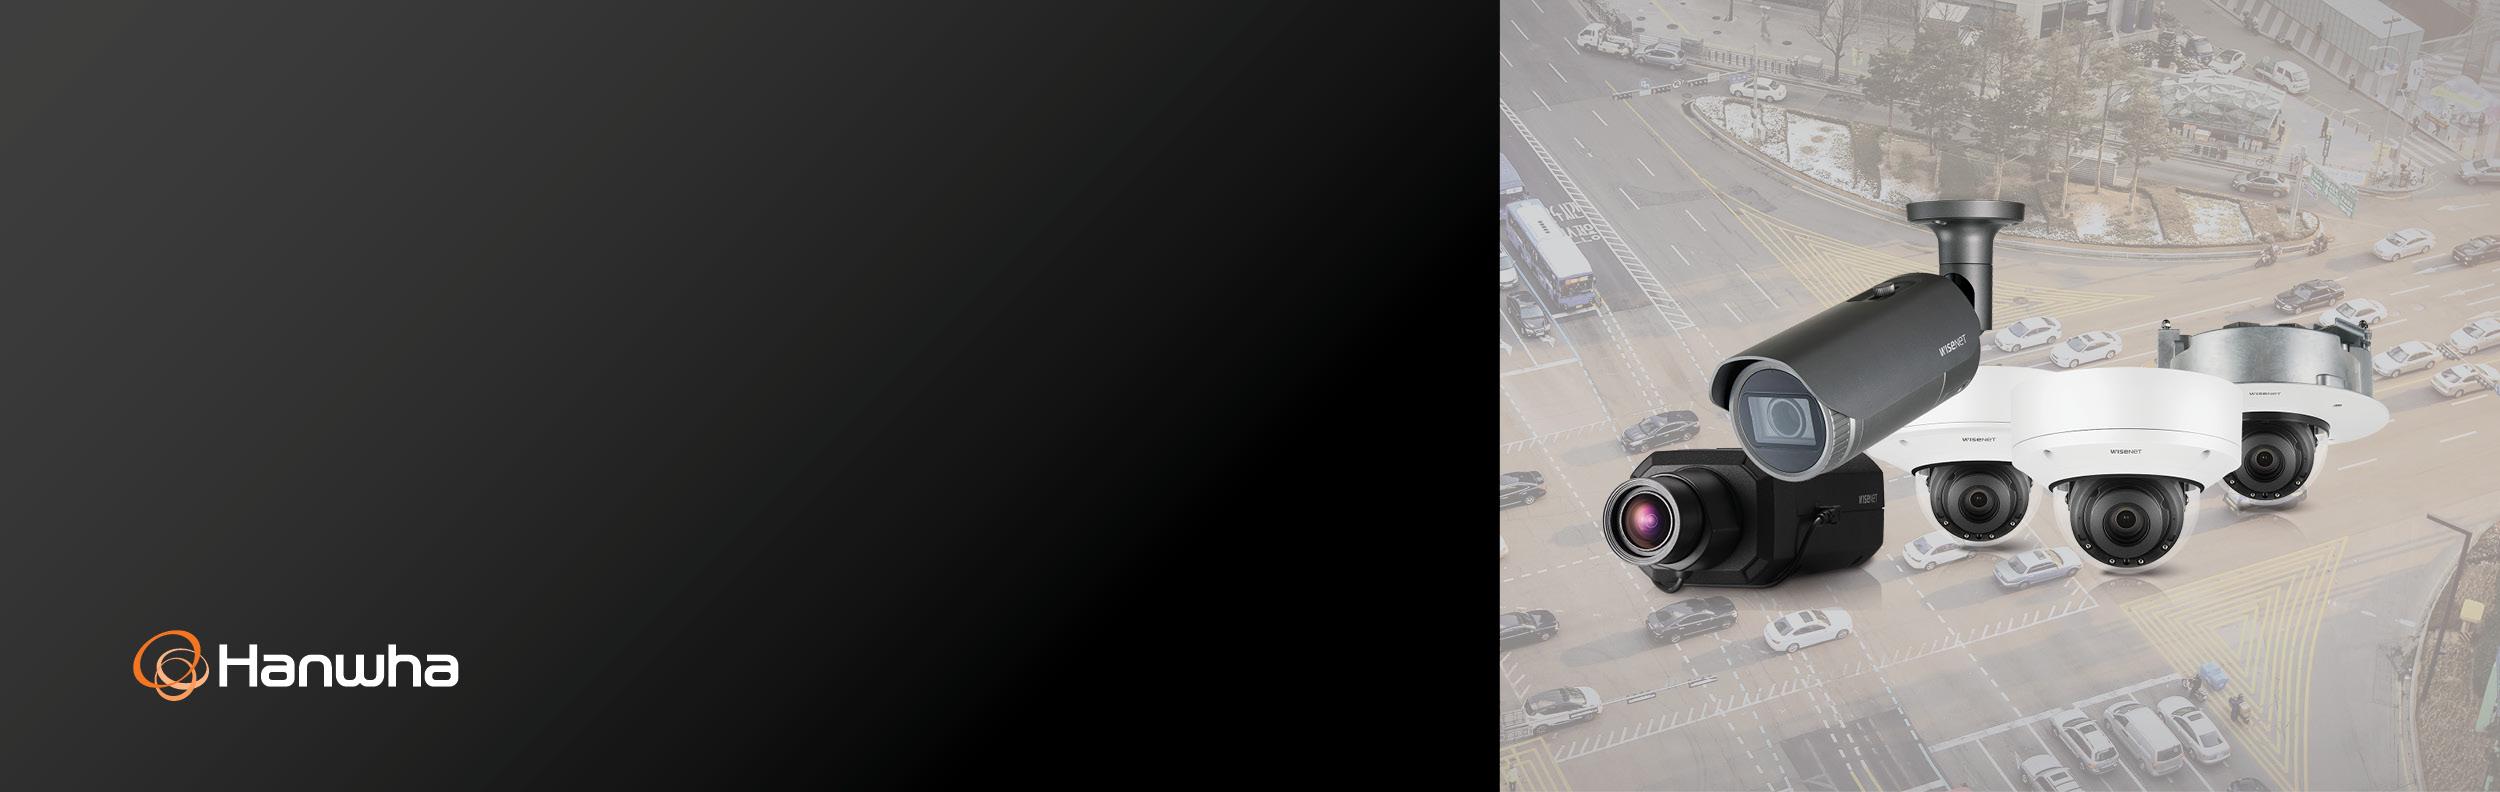 Hanwha CCTV Solutions